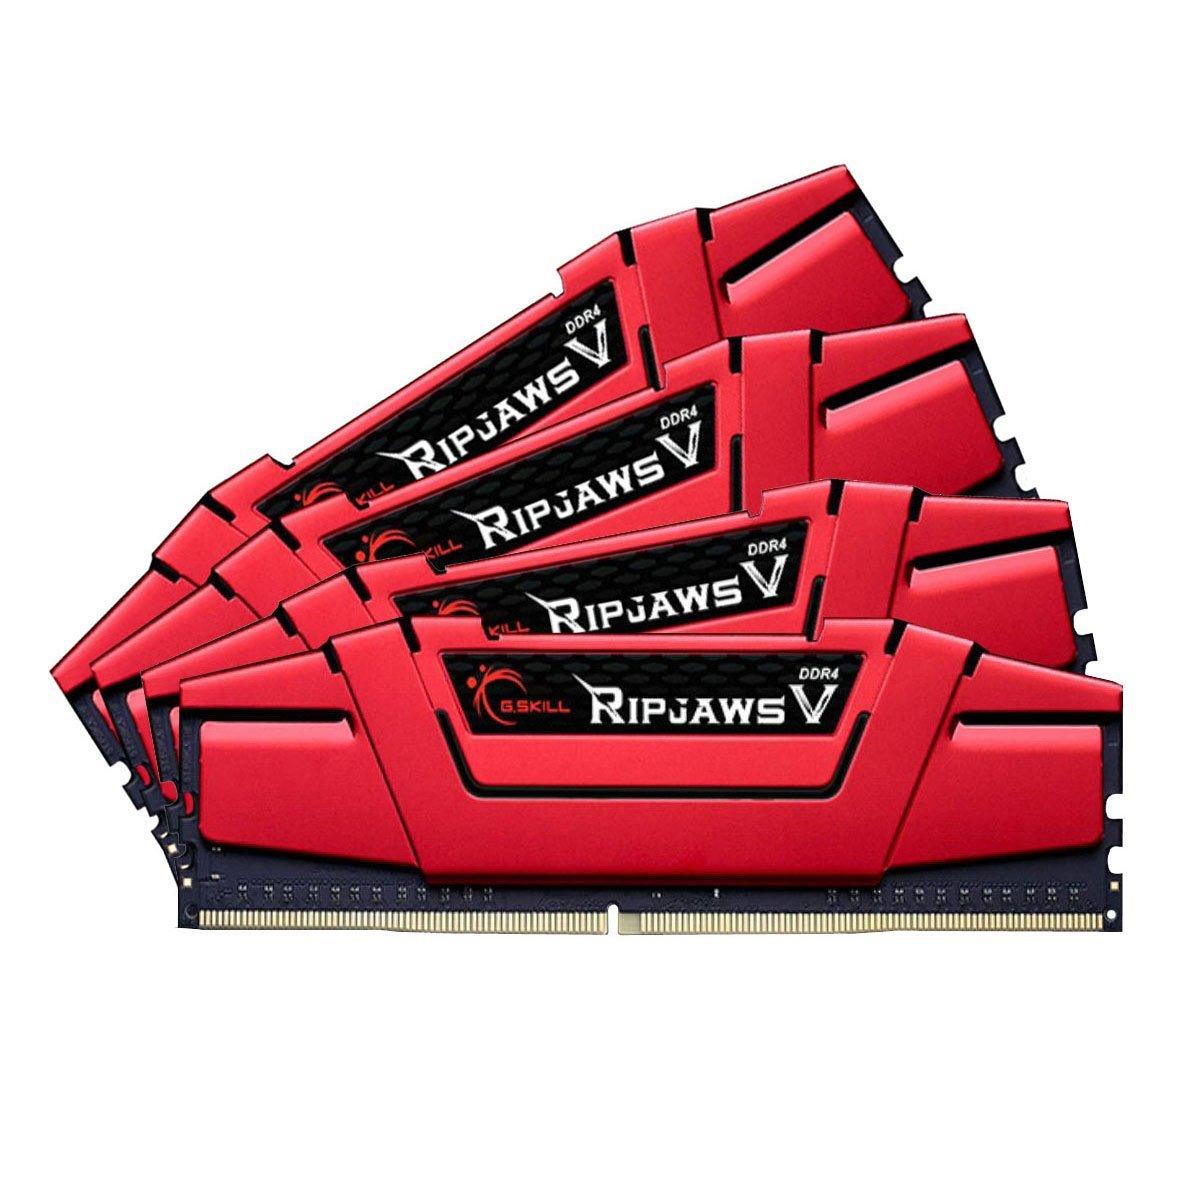 DDR4 4x8GB (3466) G.Skill F4-3466C16Q-32GVR